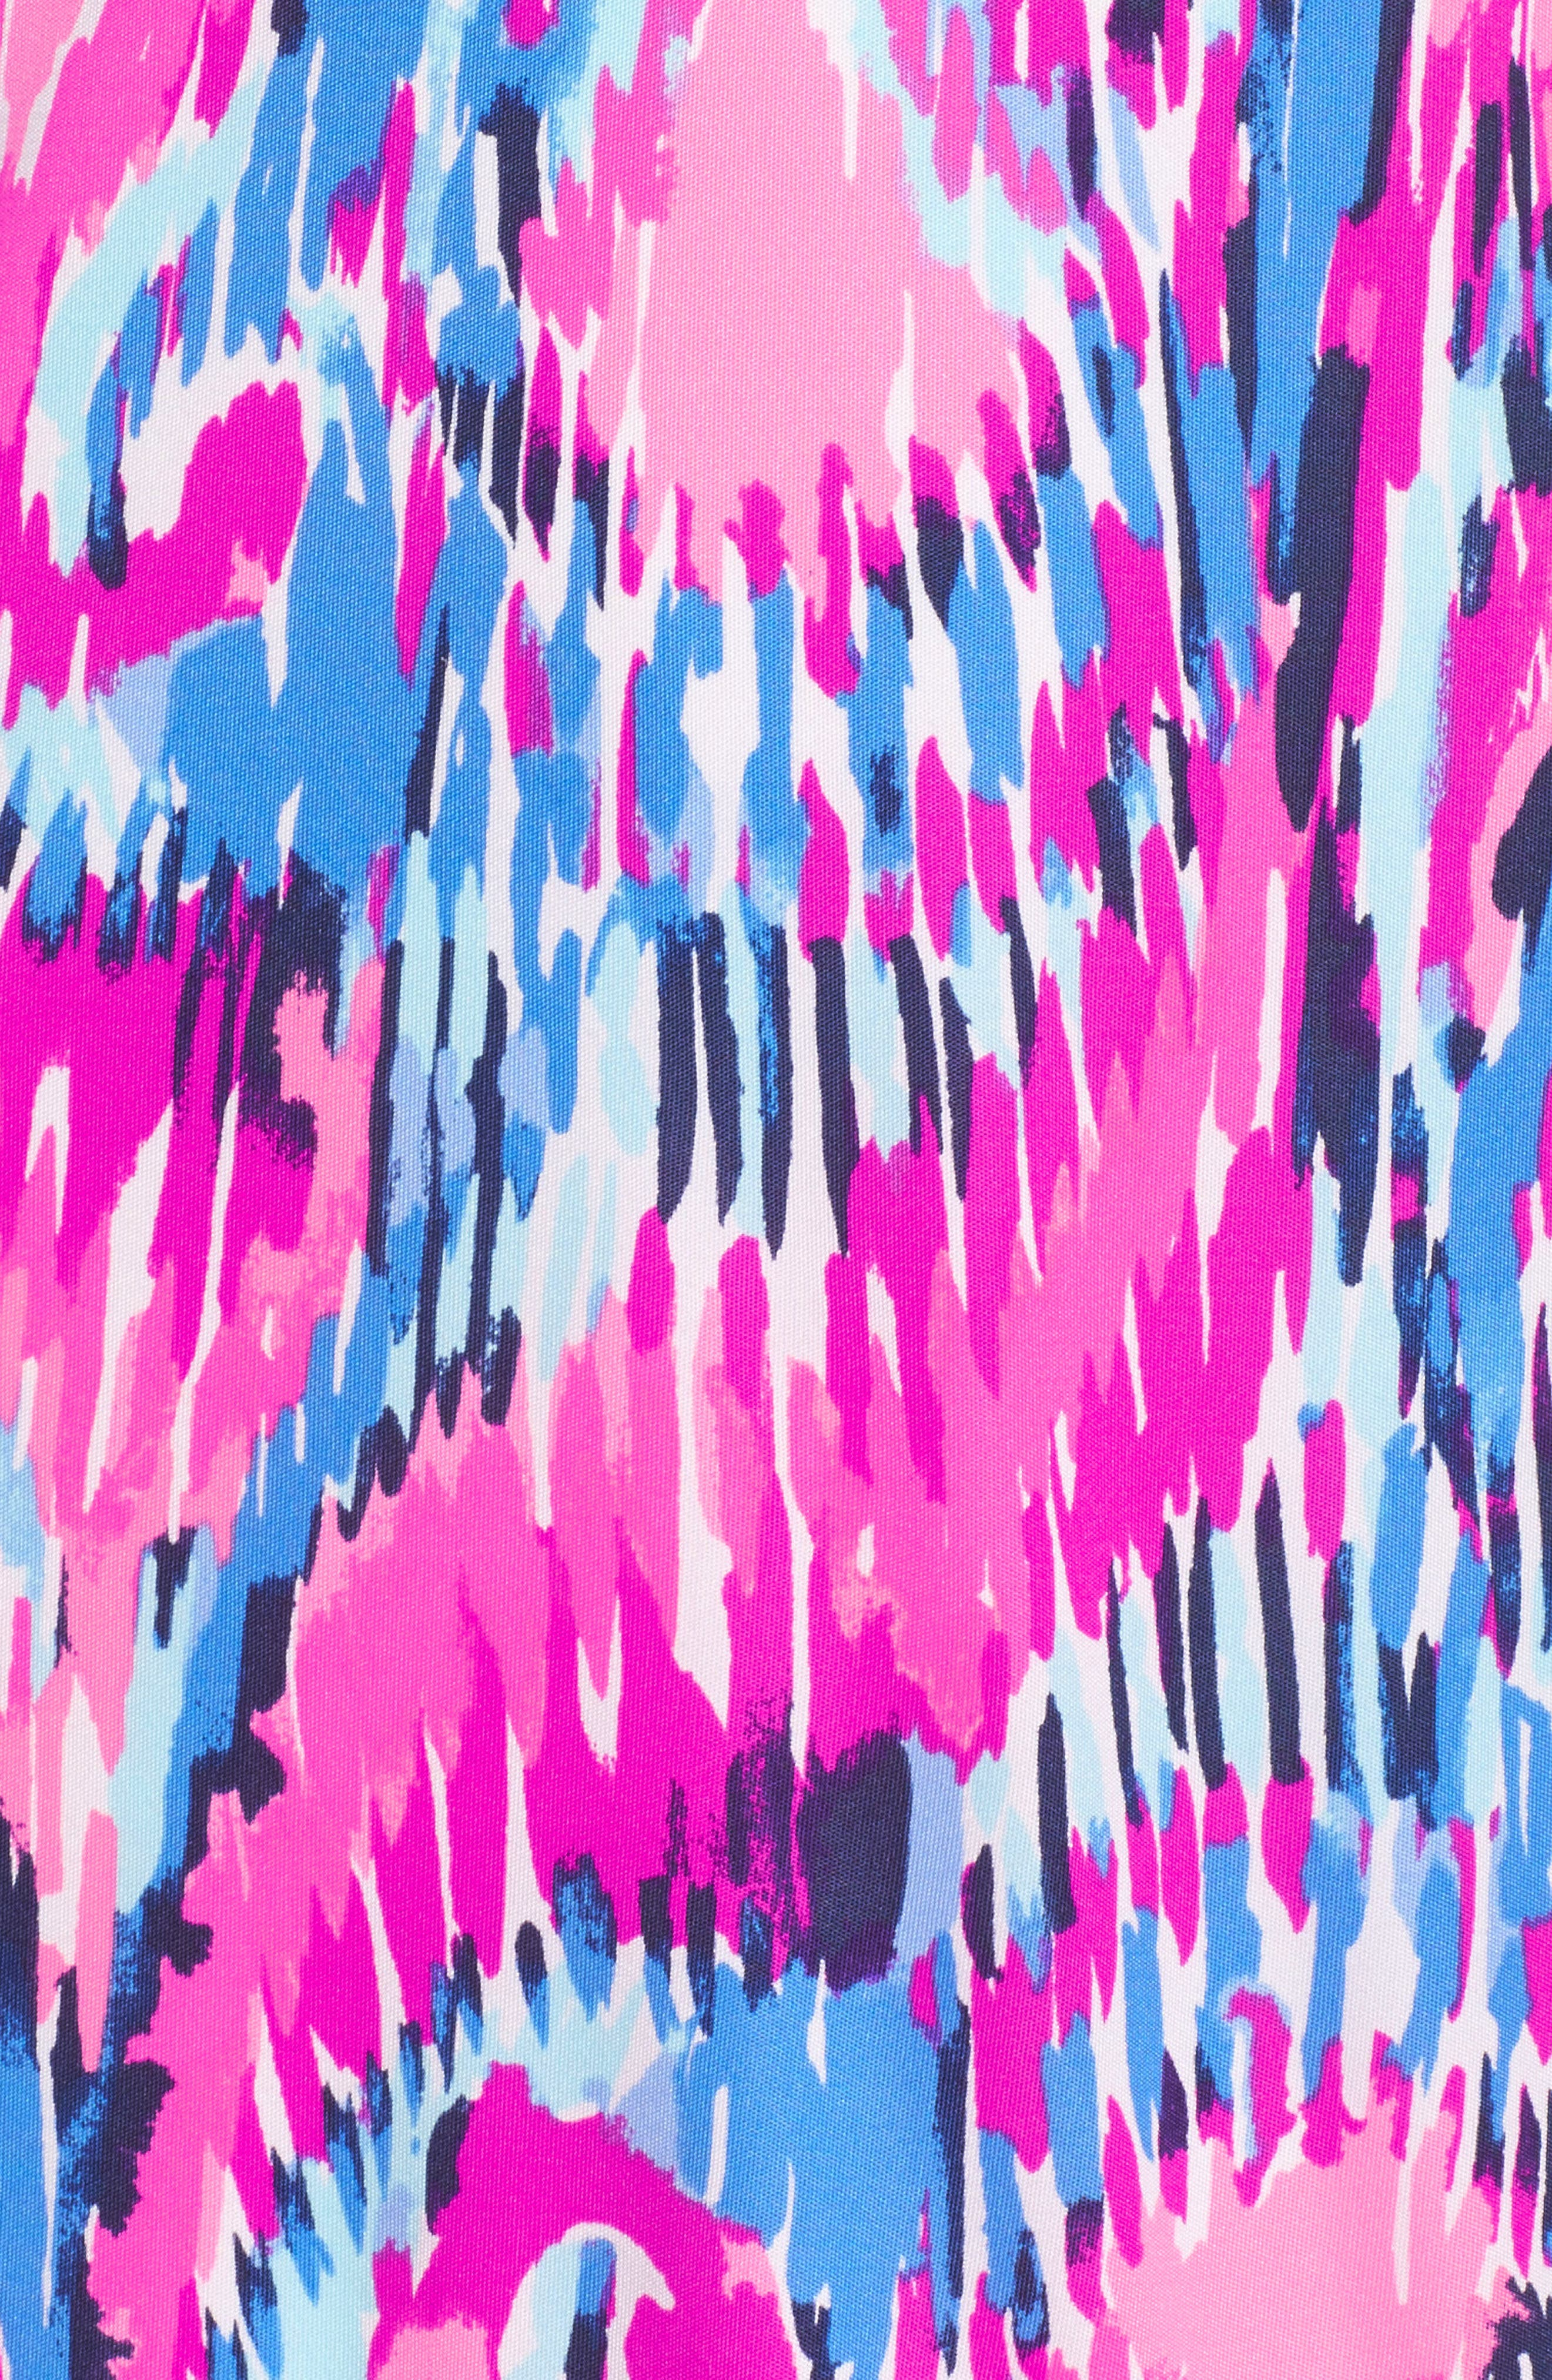 Amante One-Shoulder Silk Dress,                             Alternate thumbnail 6, color,                             650